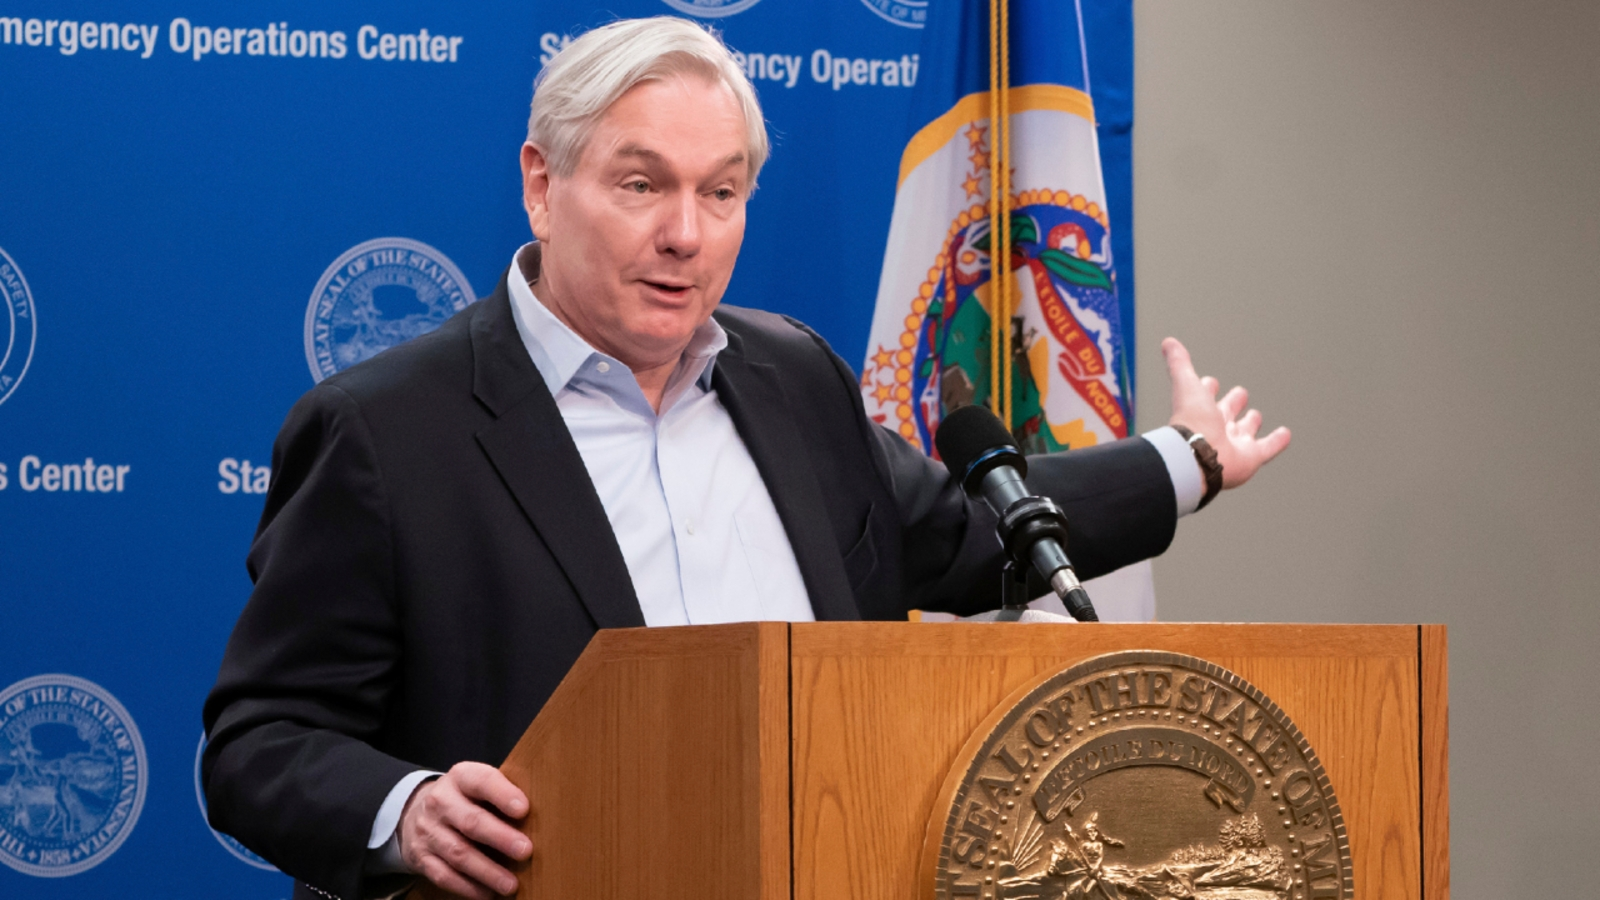 Dr. Michael Osterholm (Photo: ABC 7 News)